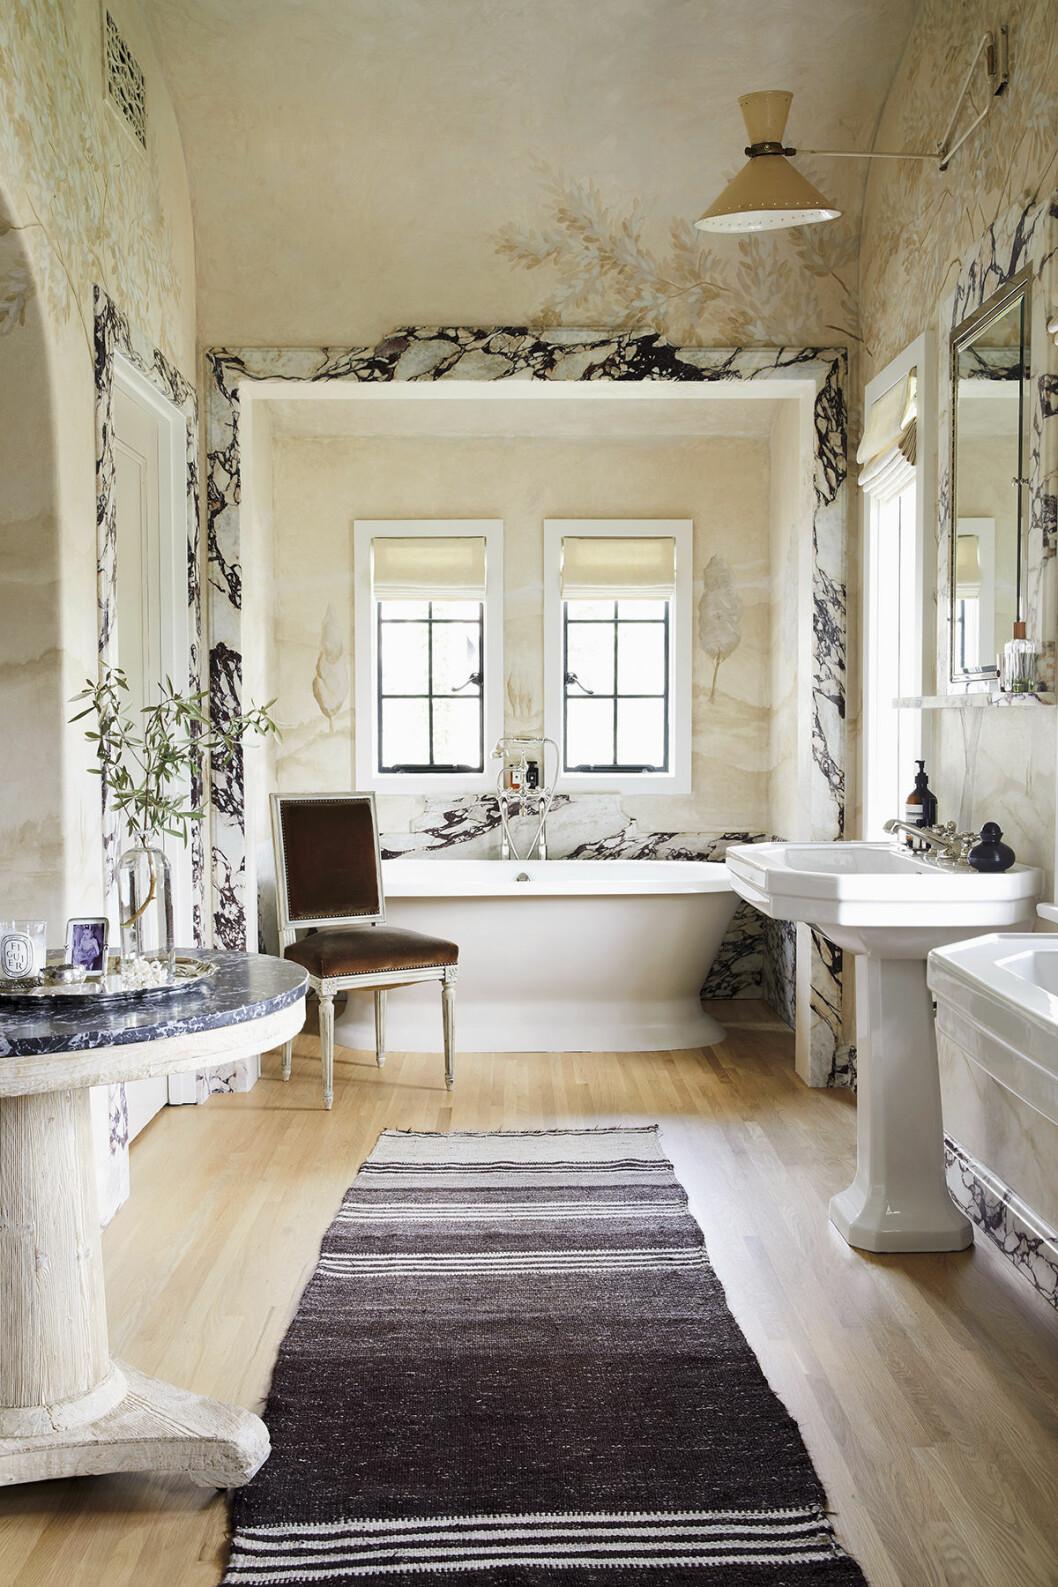 badrum marmor mural vaggmalning inspiration